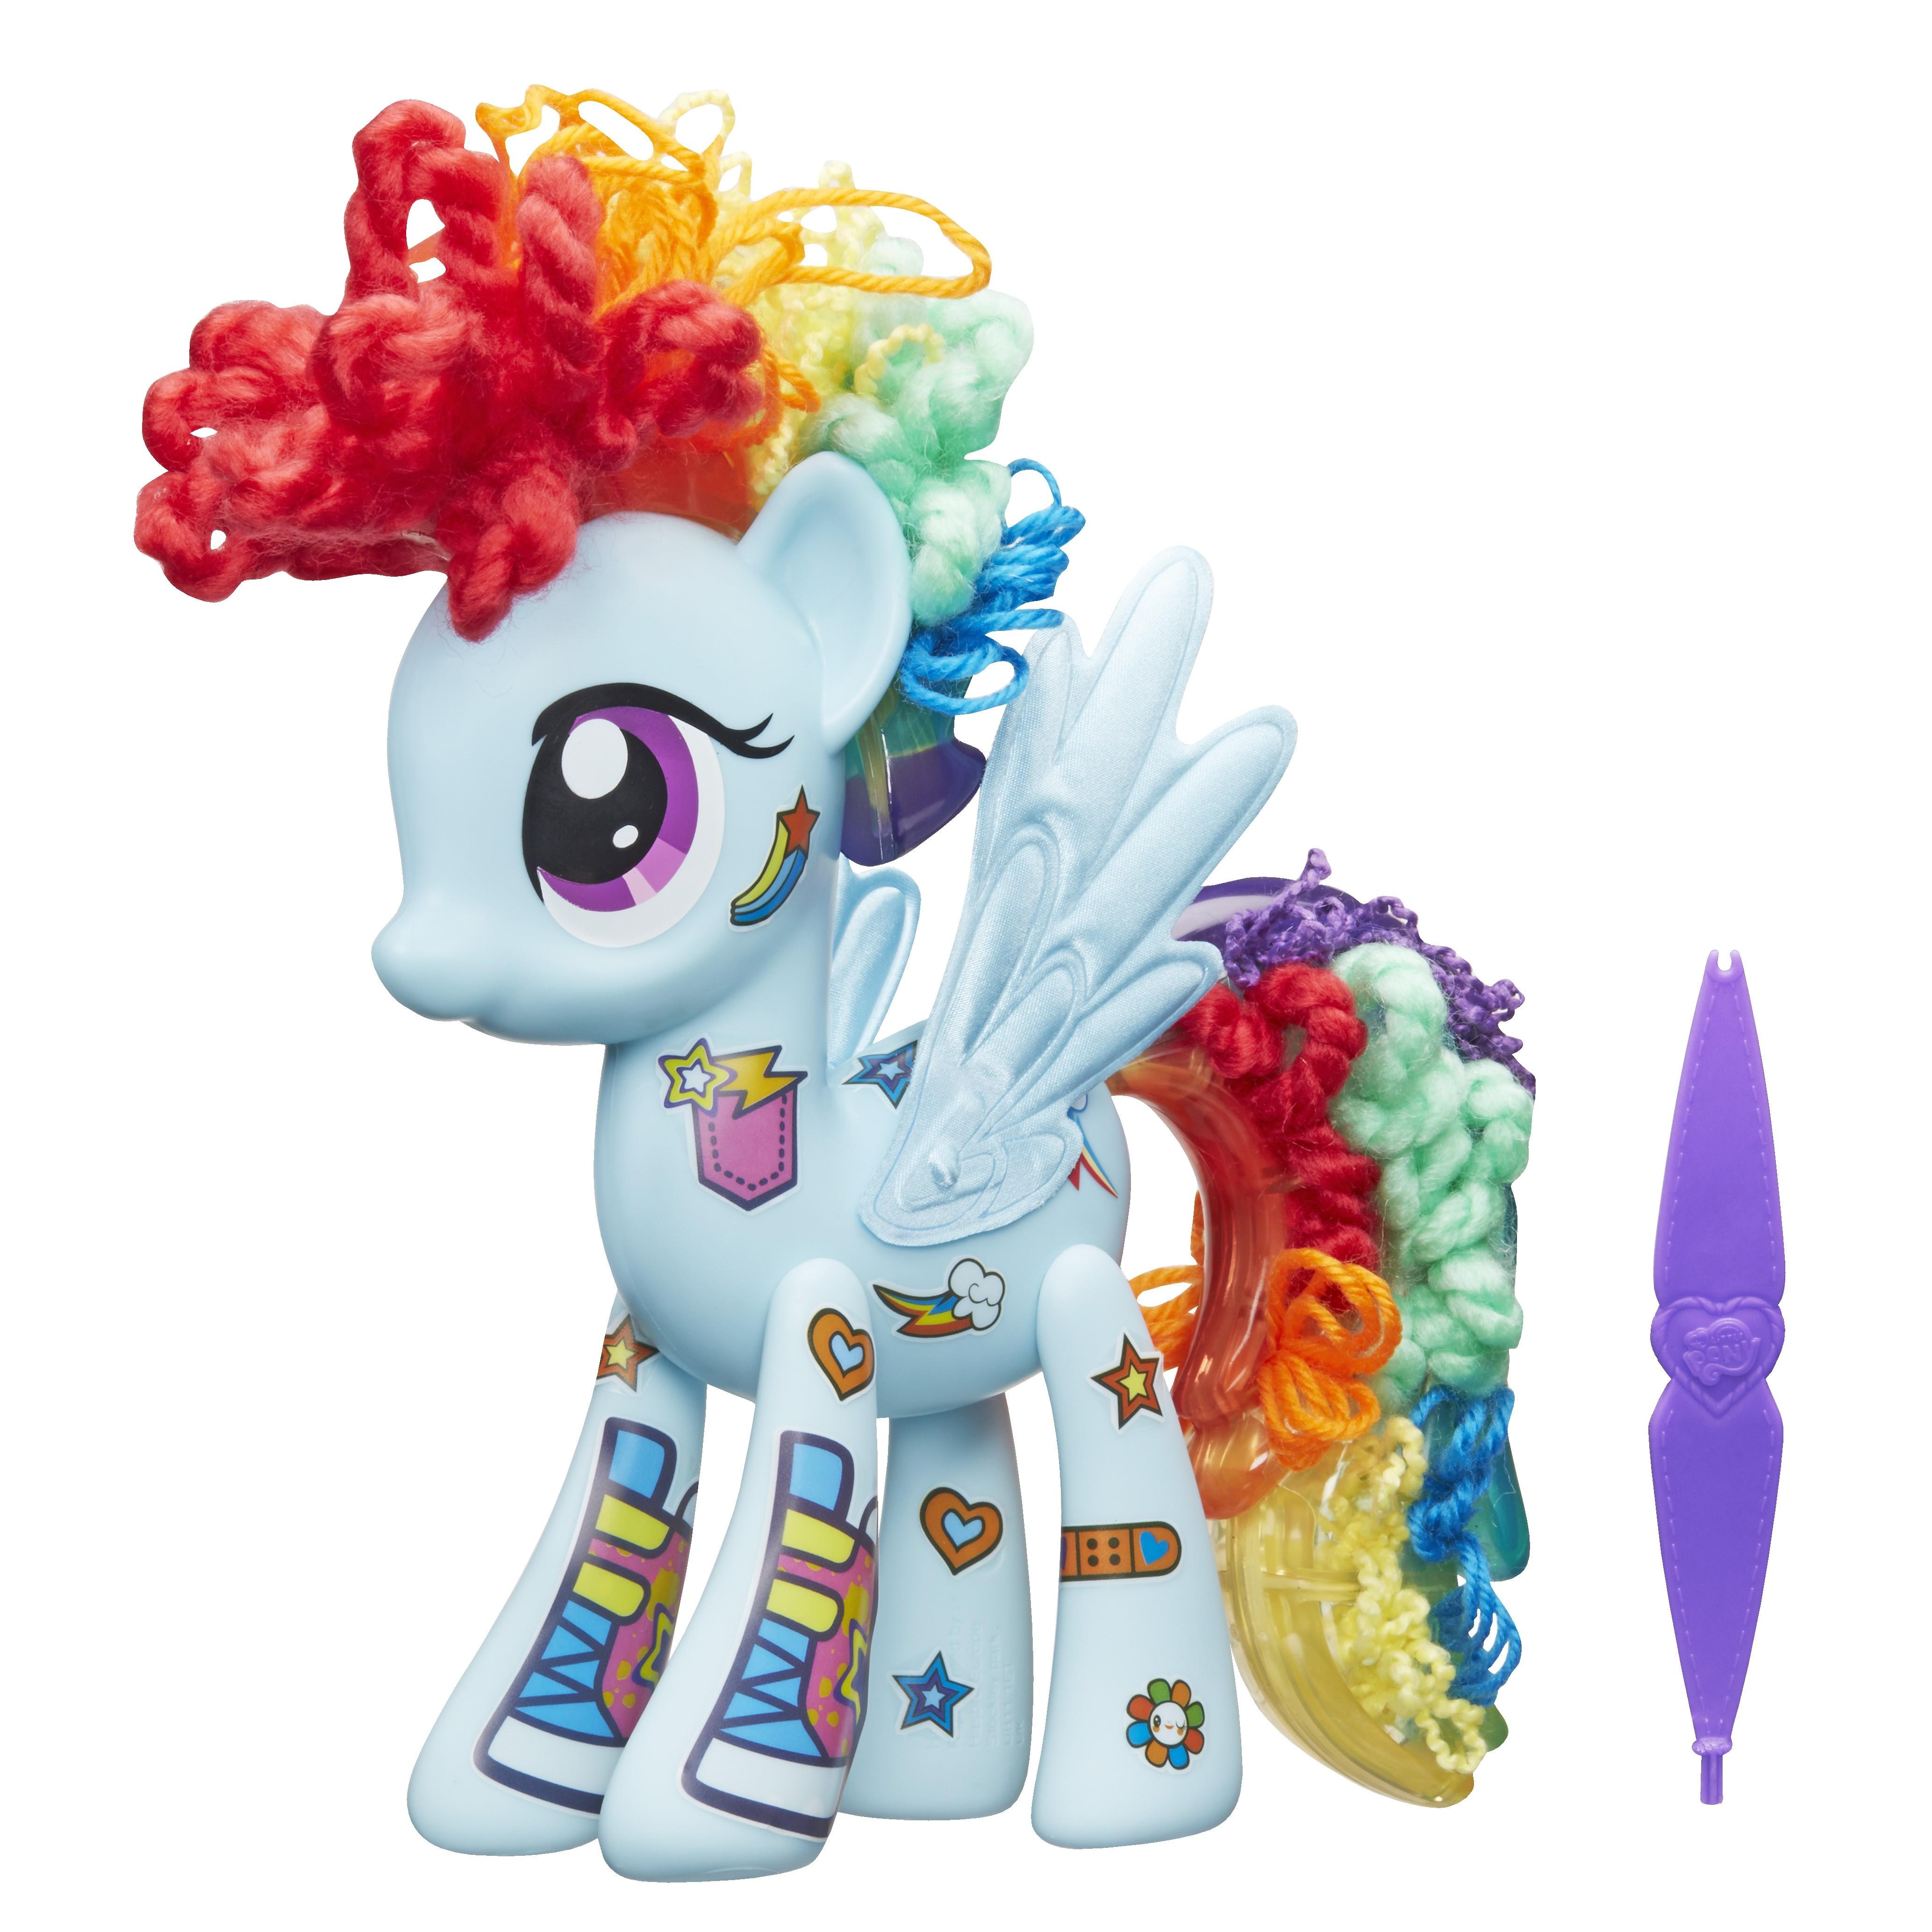 My Little Pony My Little Pony Создай свою пони hasbro тематический набор создай свою пони старлайт глиммер my little pony b3591 b5791